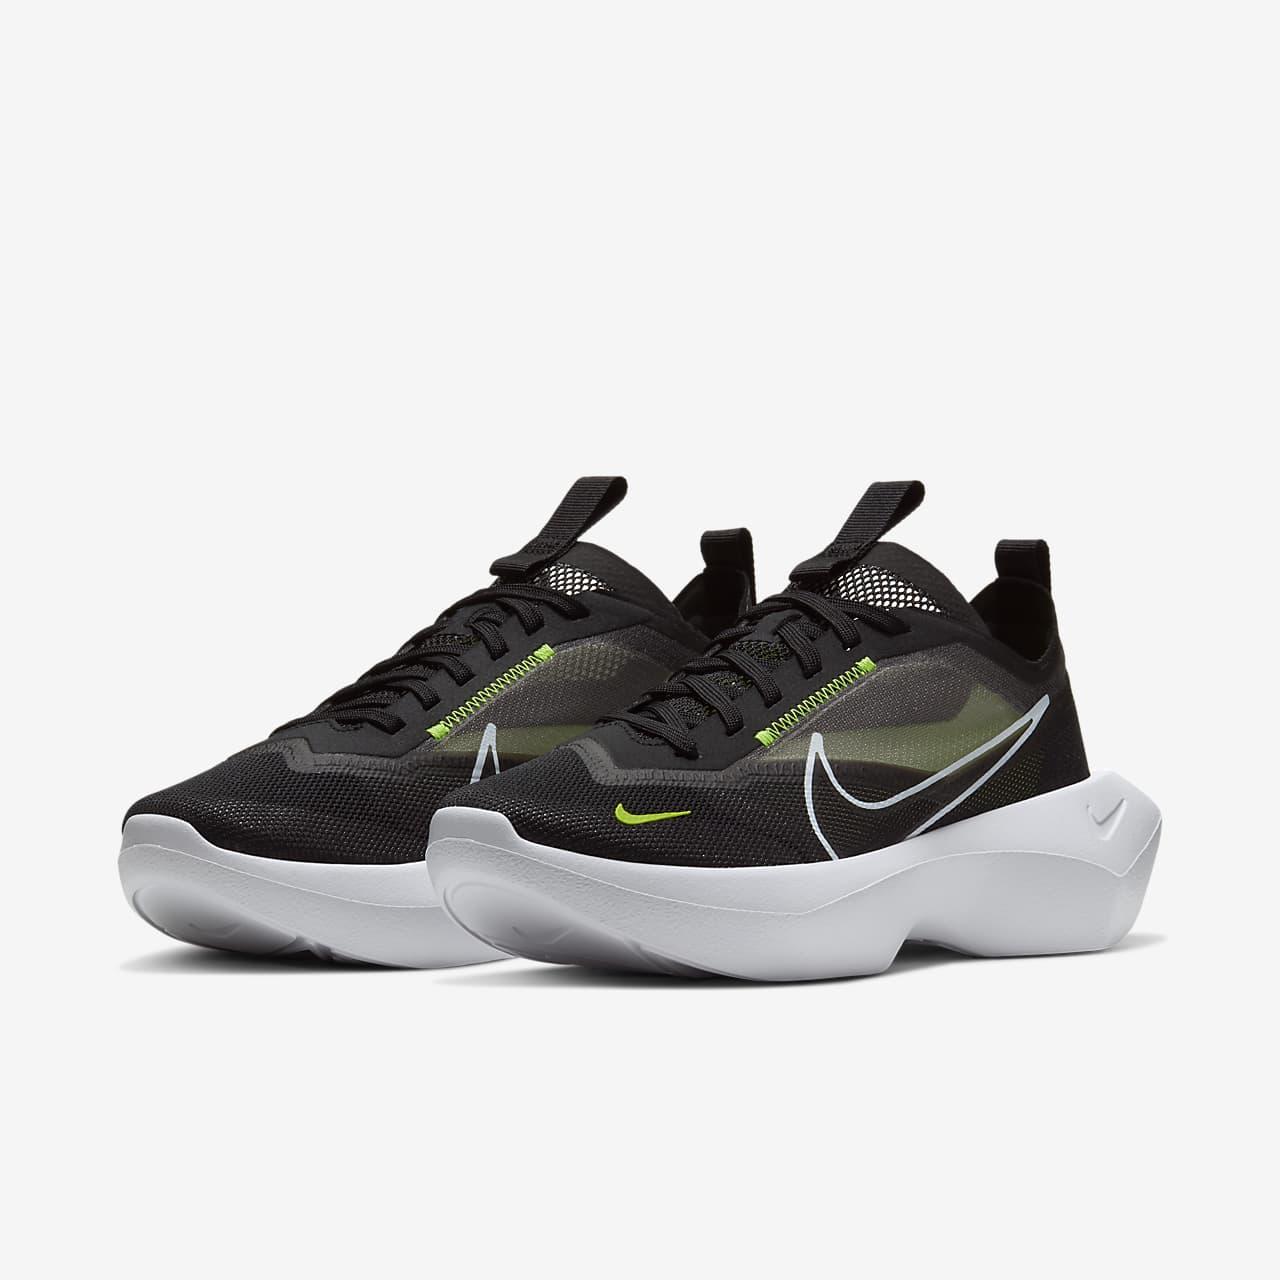 Chaussure Nike Vista Lite pour Femme